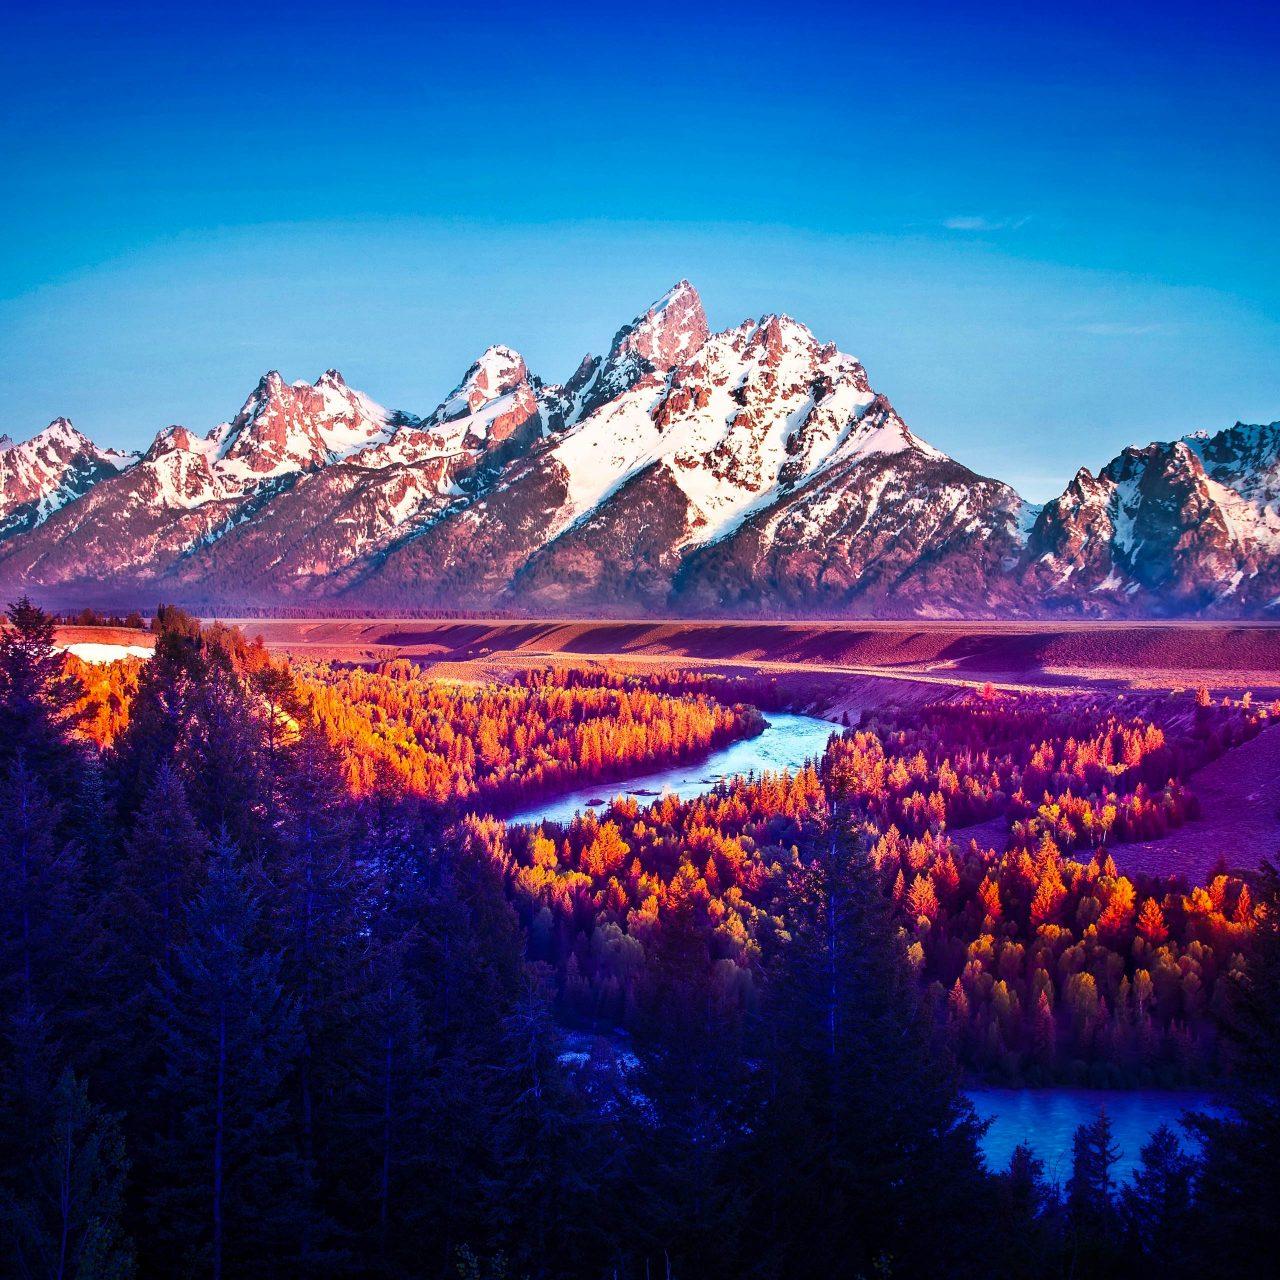 Smartphone Wallpaper 4k Nature: Mountains Nature Snow Blue Sky Trees 4K Wallpaper